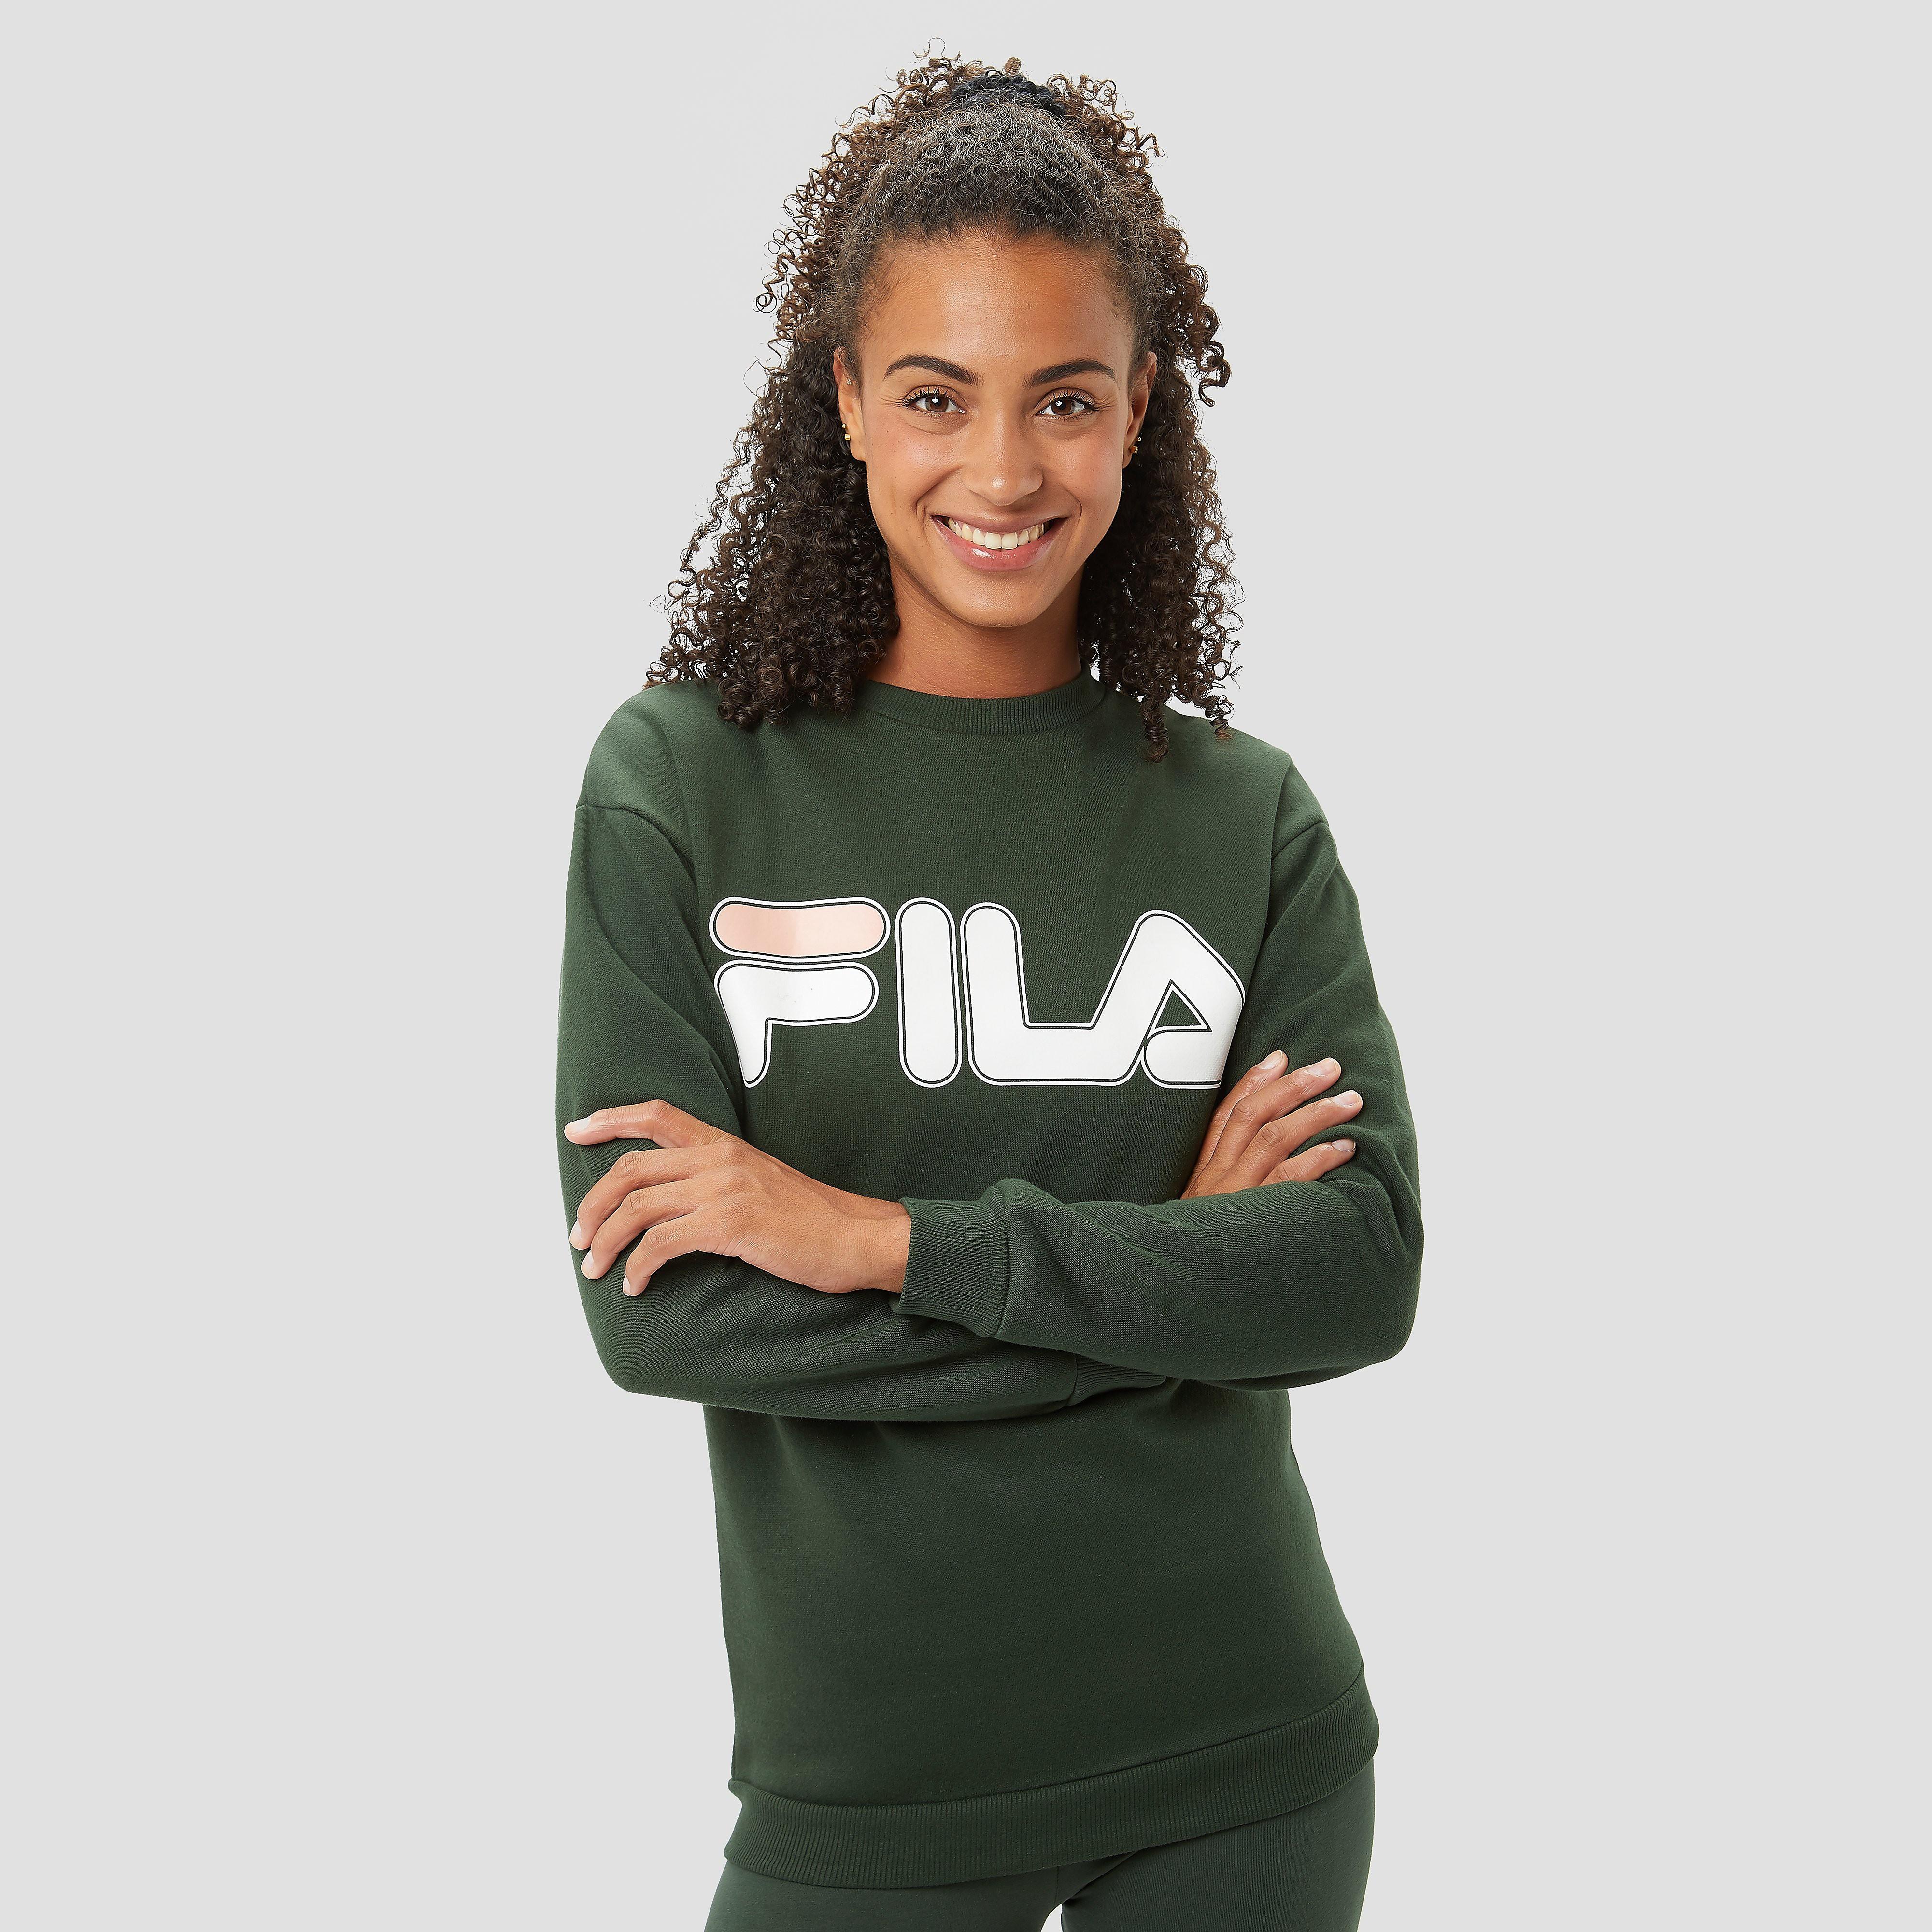 FILA Cydonia 2 crew sweater groen dames Dames